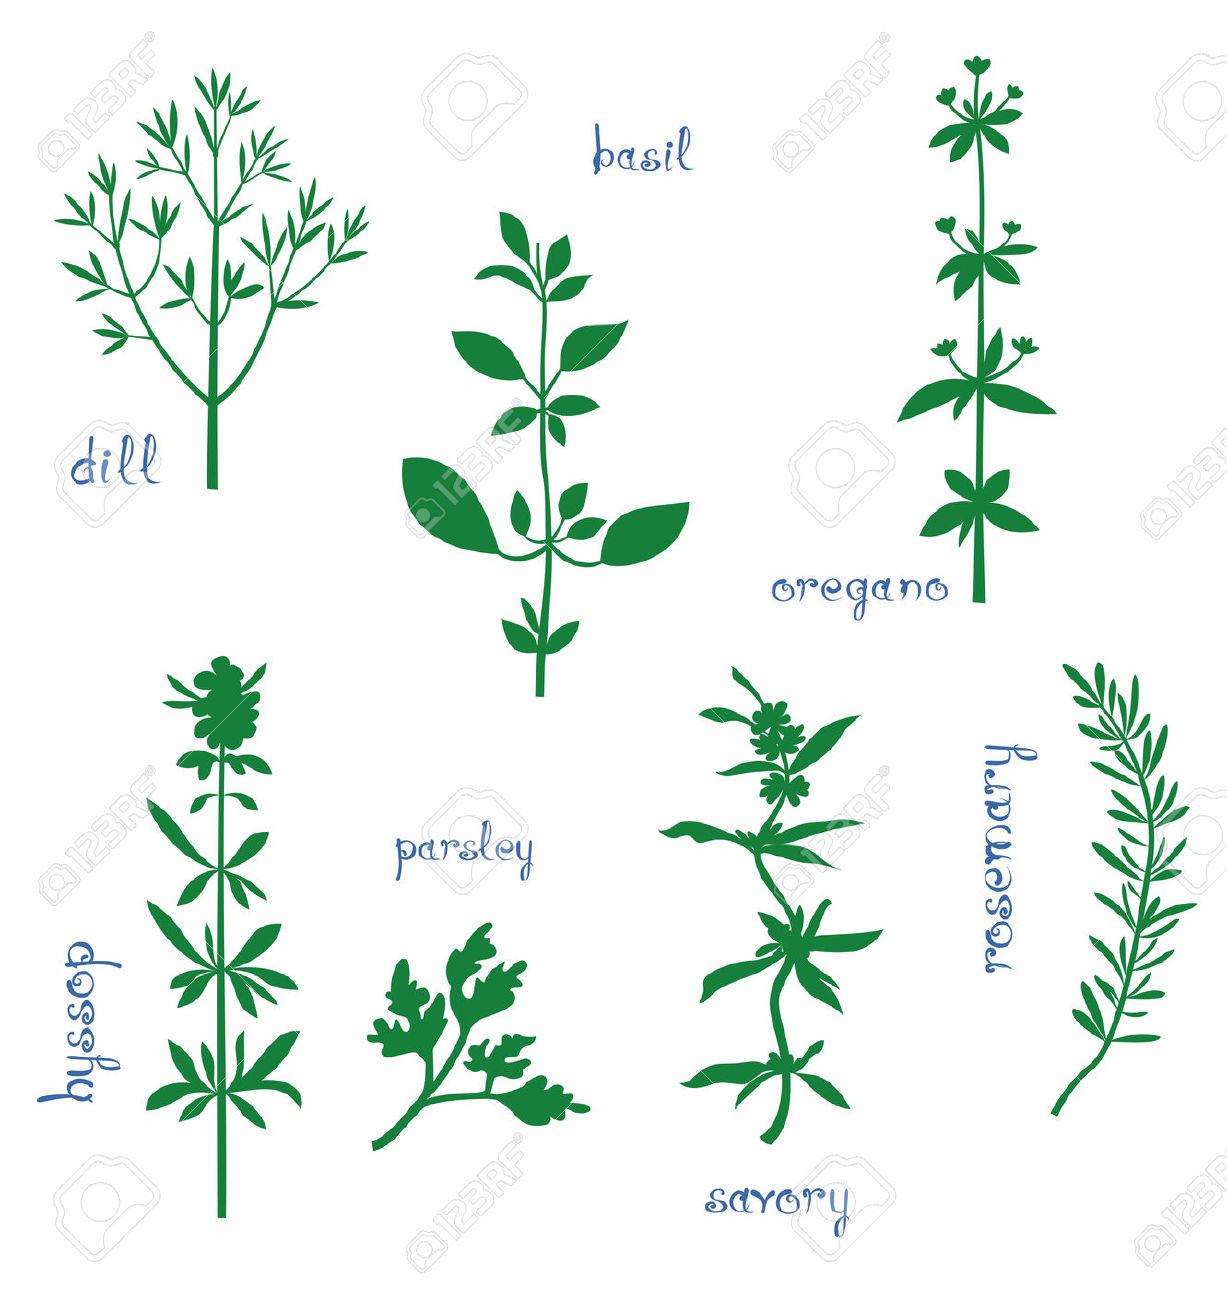 Aromatic Herbs Set. Silhouettes Of Dill, Basil, Oregano, Hyssop.